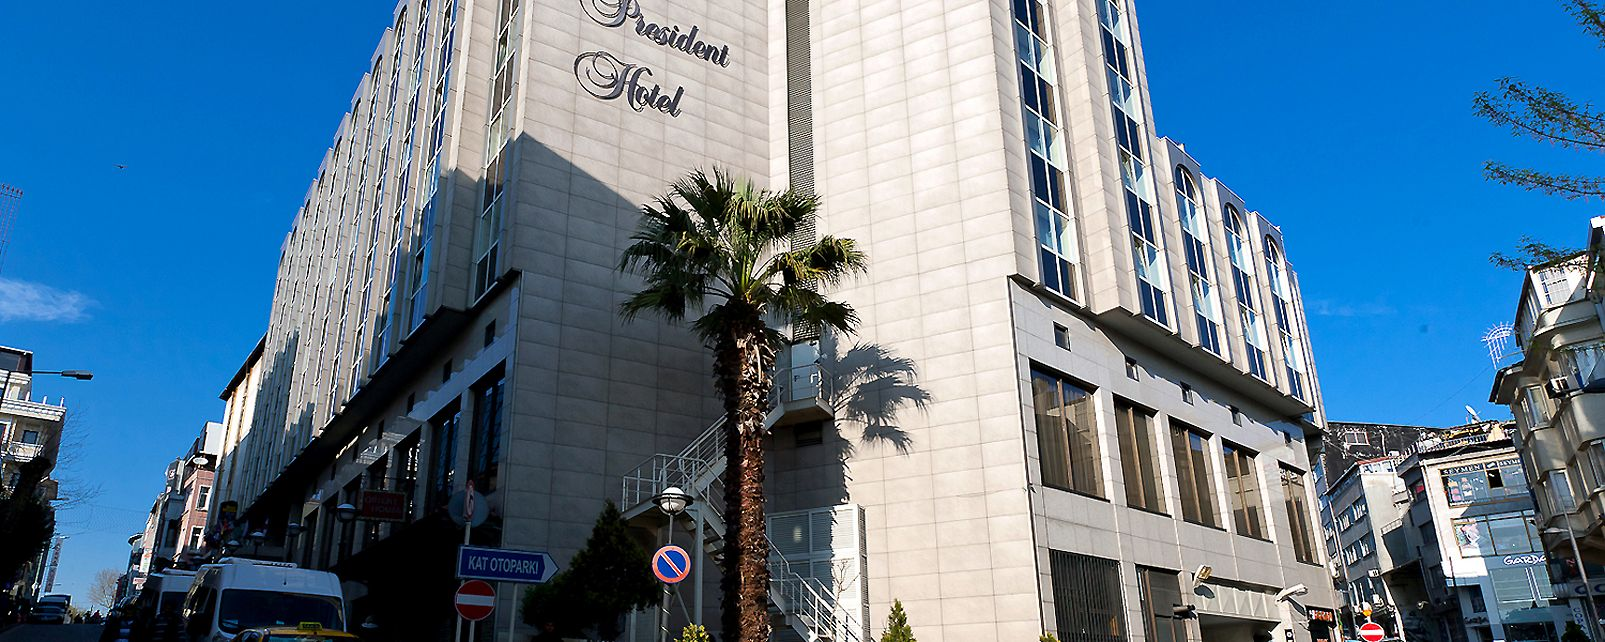 Hôtel Best Western President